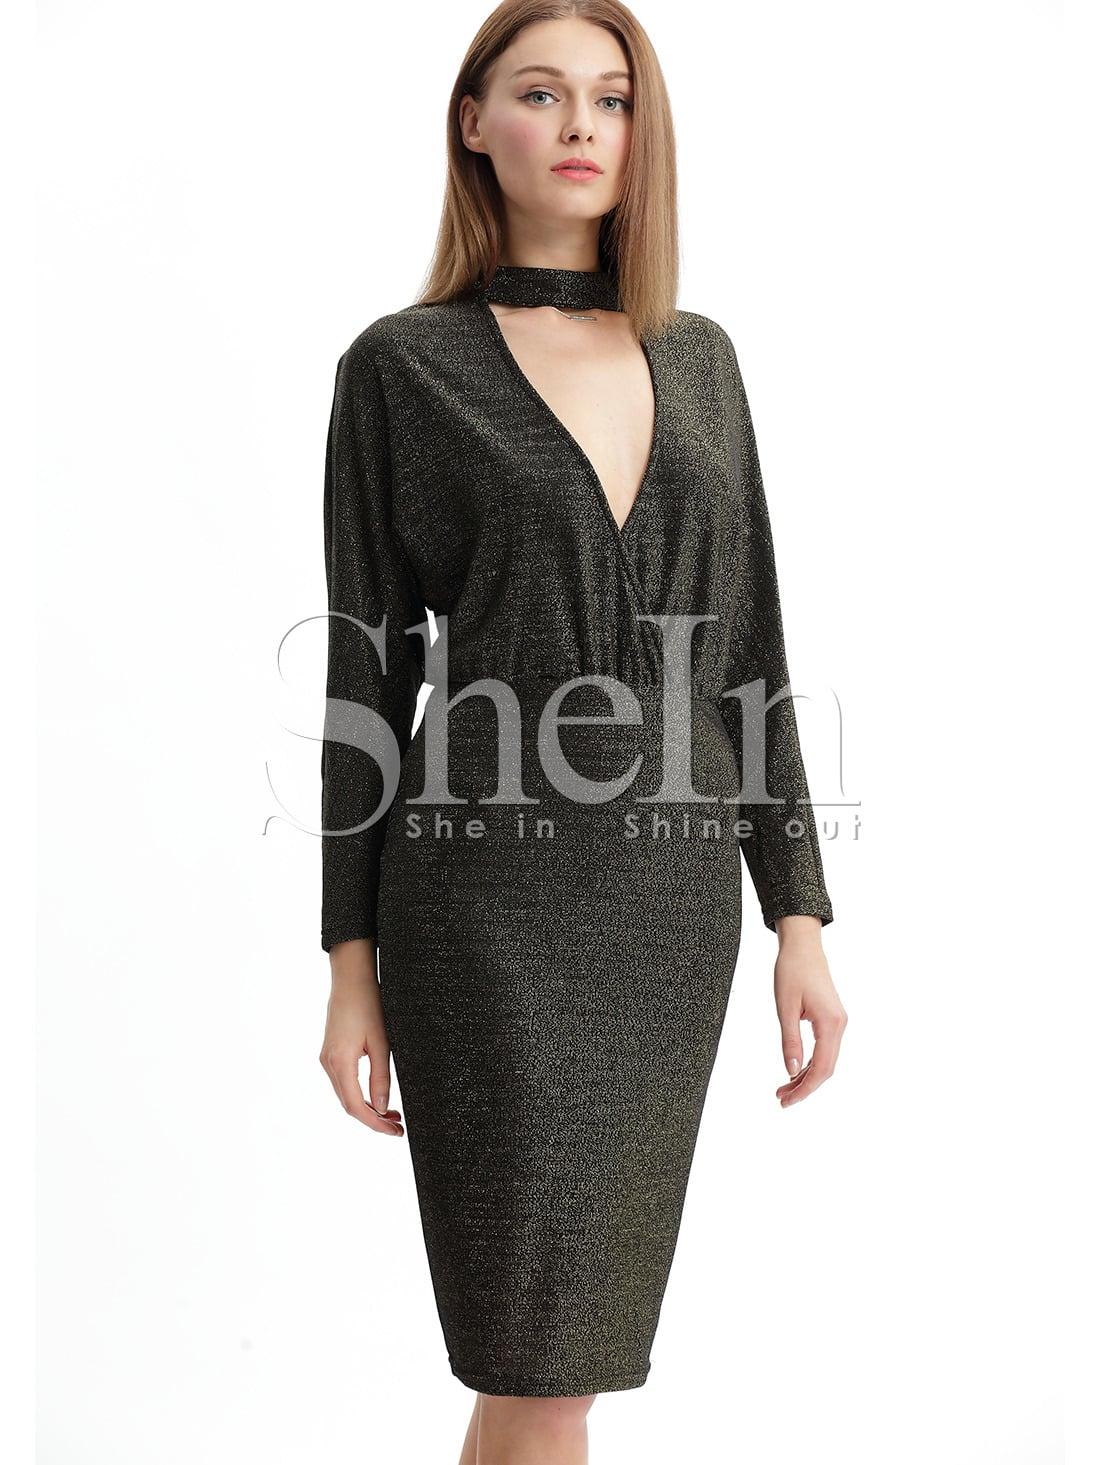 Black Long Sleeve Cut Out DressBlack Long Sleeve Cut Out Dress<br><br>color: Black<br>size: S,XS